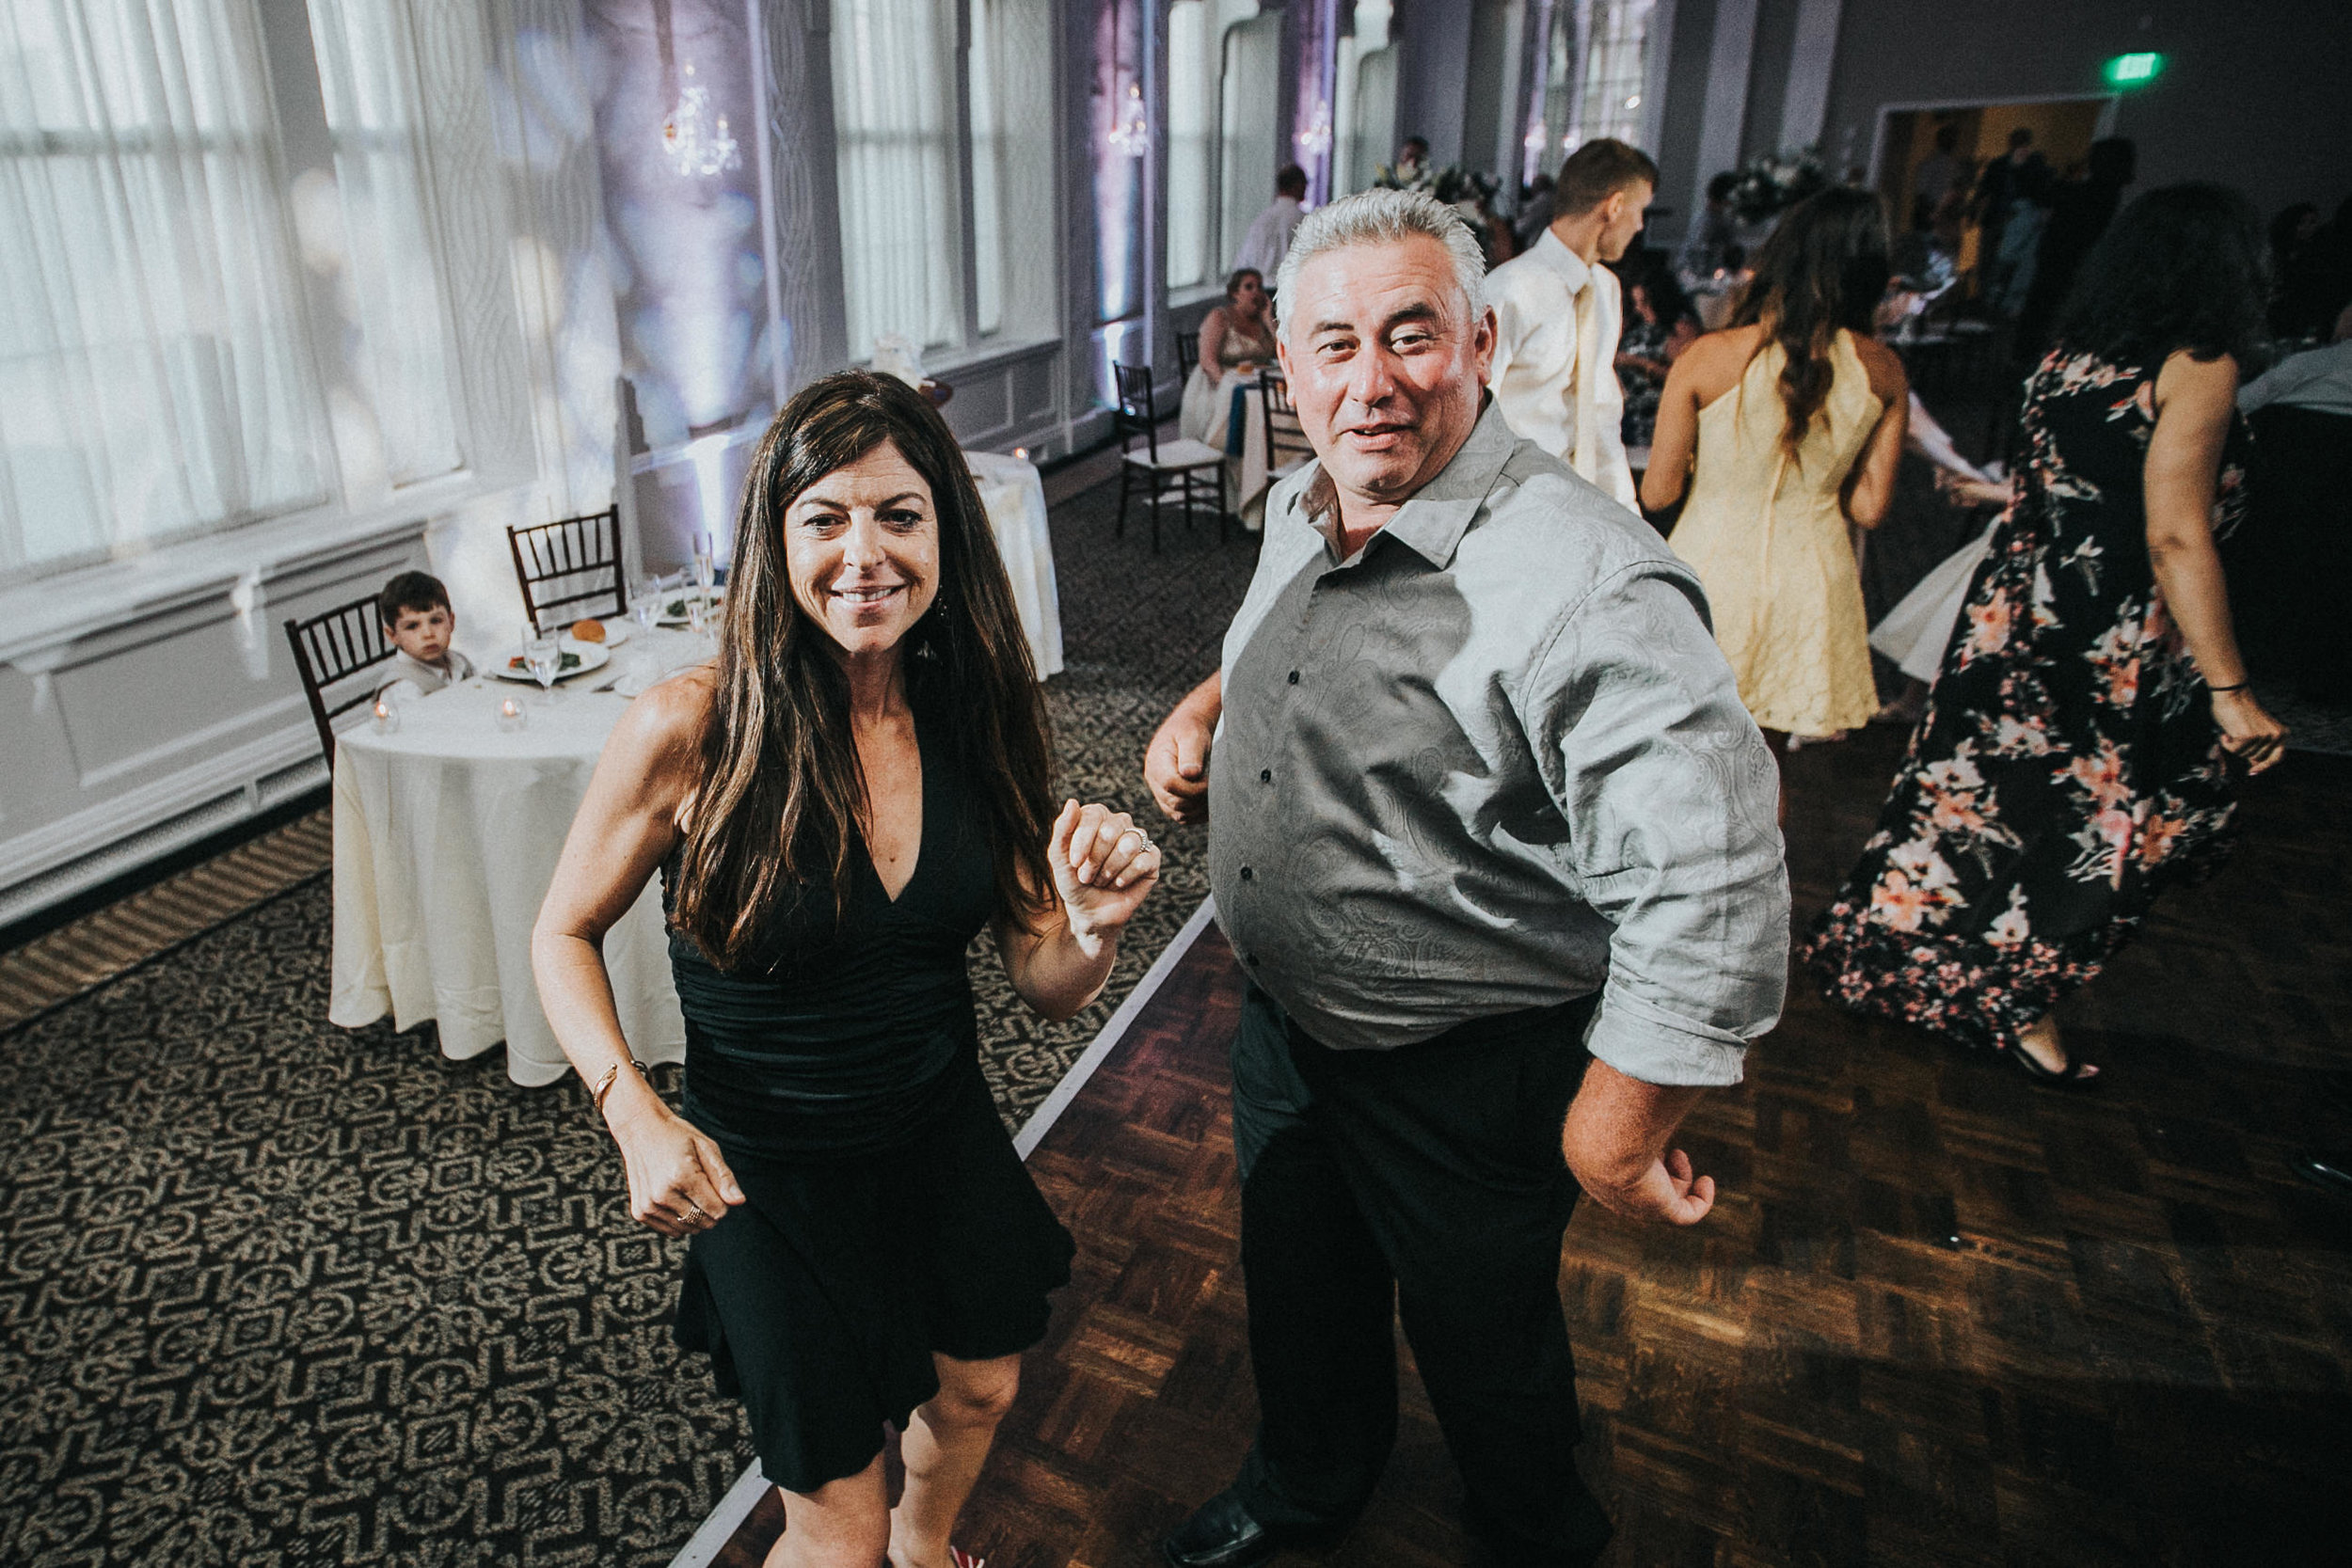 JennaLynnPhotography-NJWeddingPhotographer-Wedding-TheBerkeley-AsburyPark-Allison&Michael-Reception-113.jpg